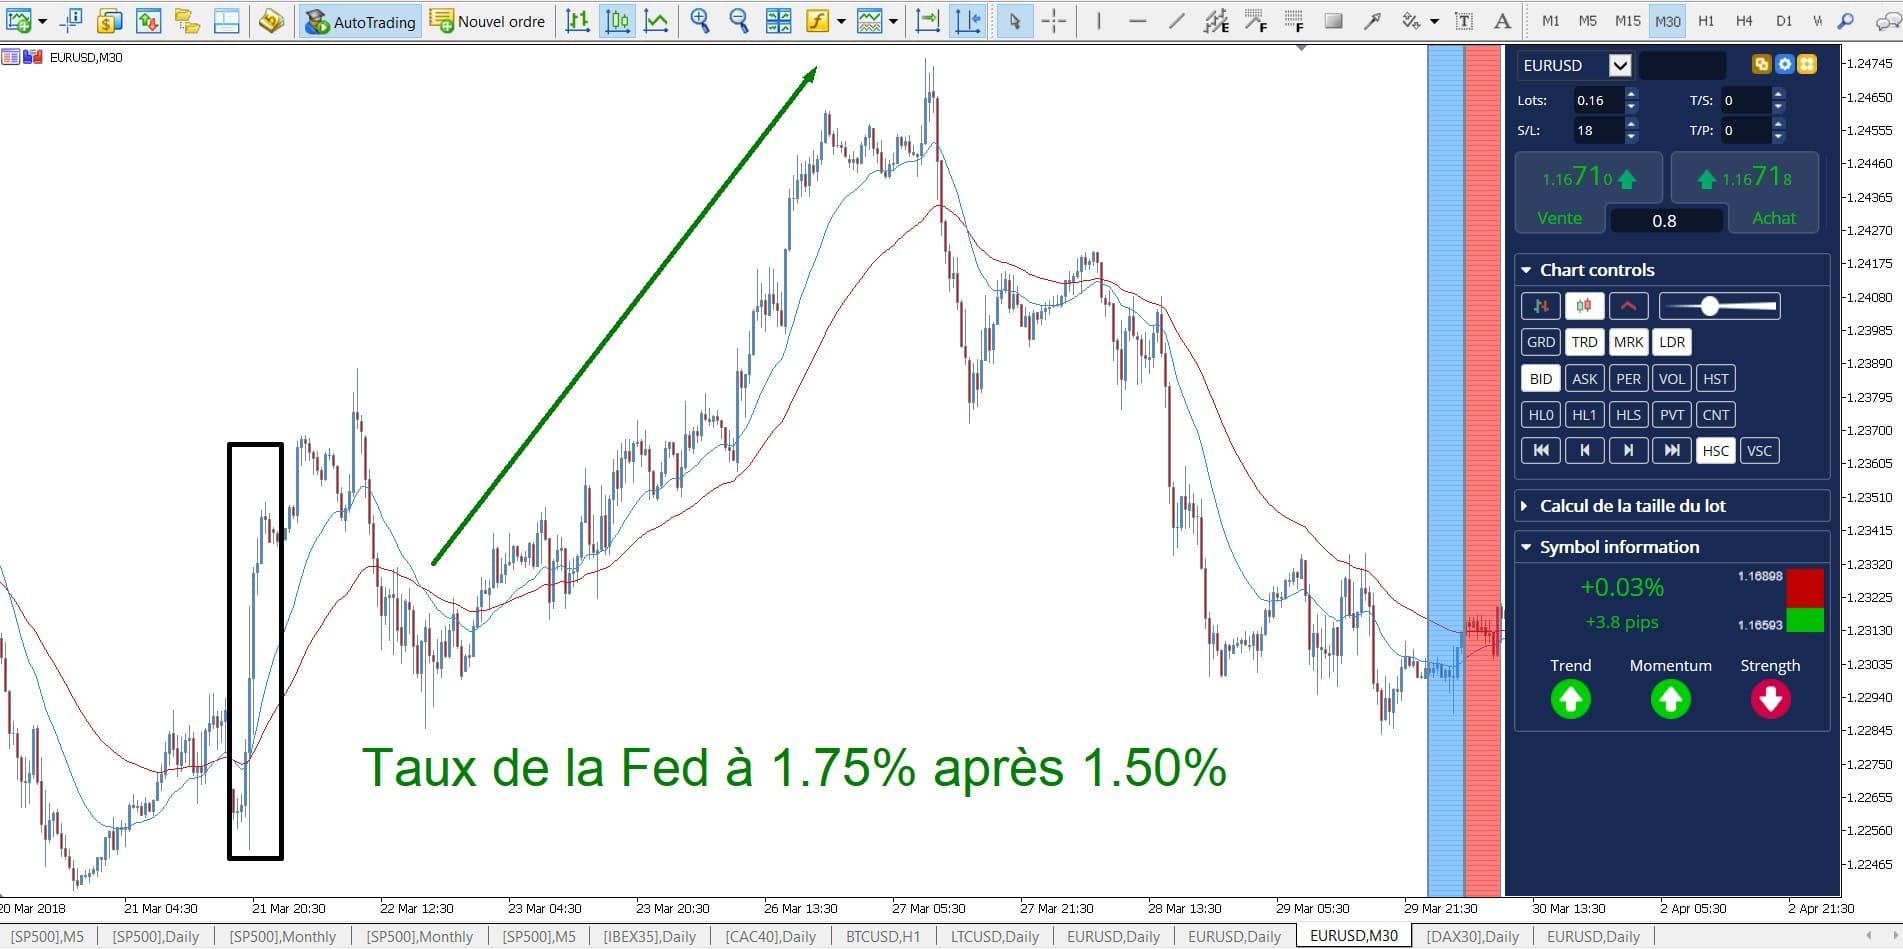 eur usd trading news - effect euro dollar koers